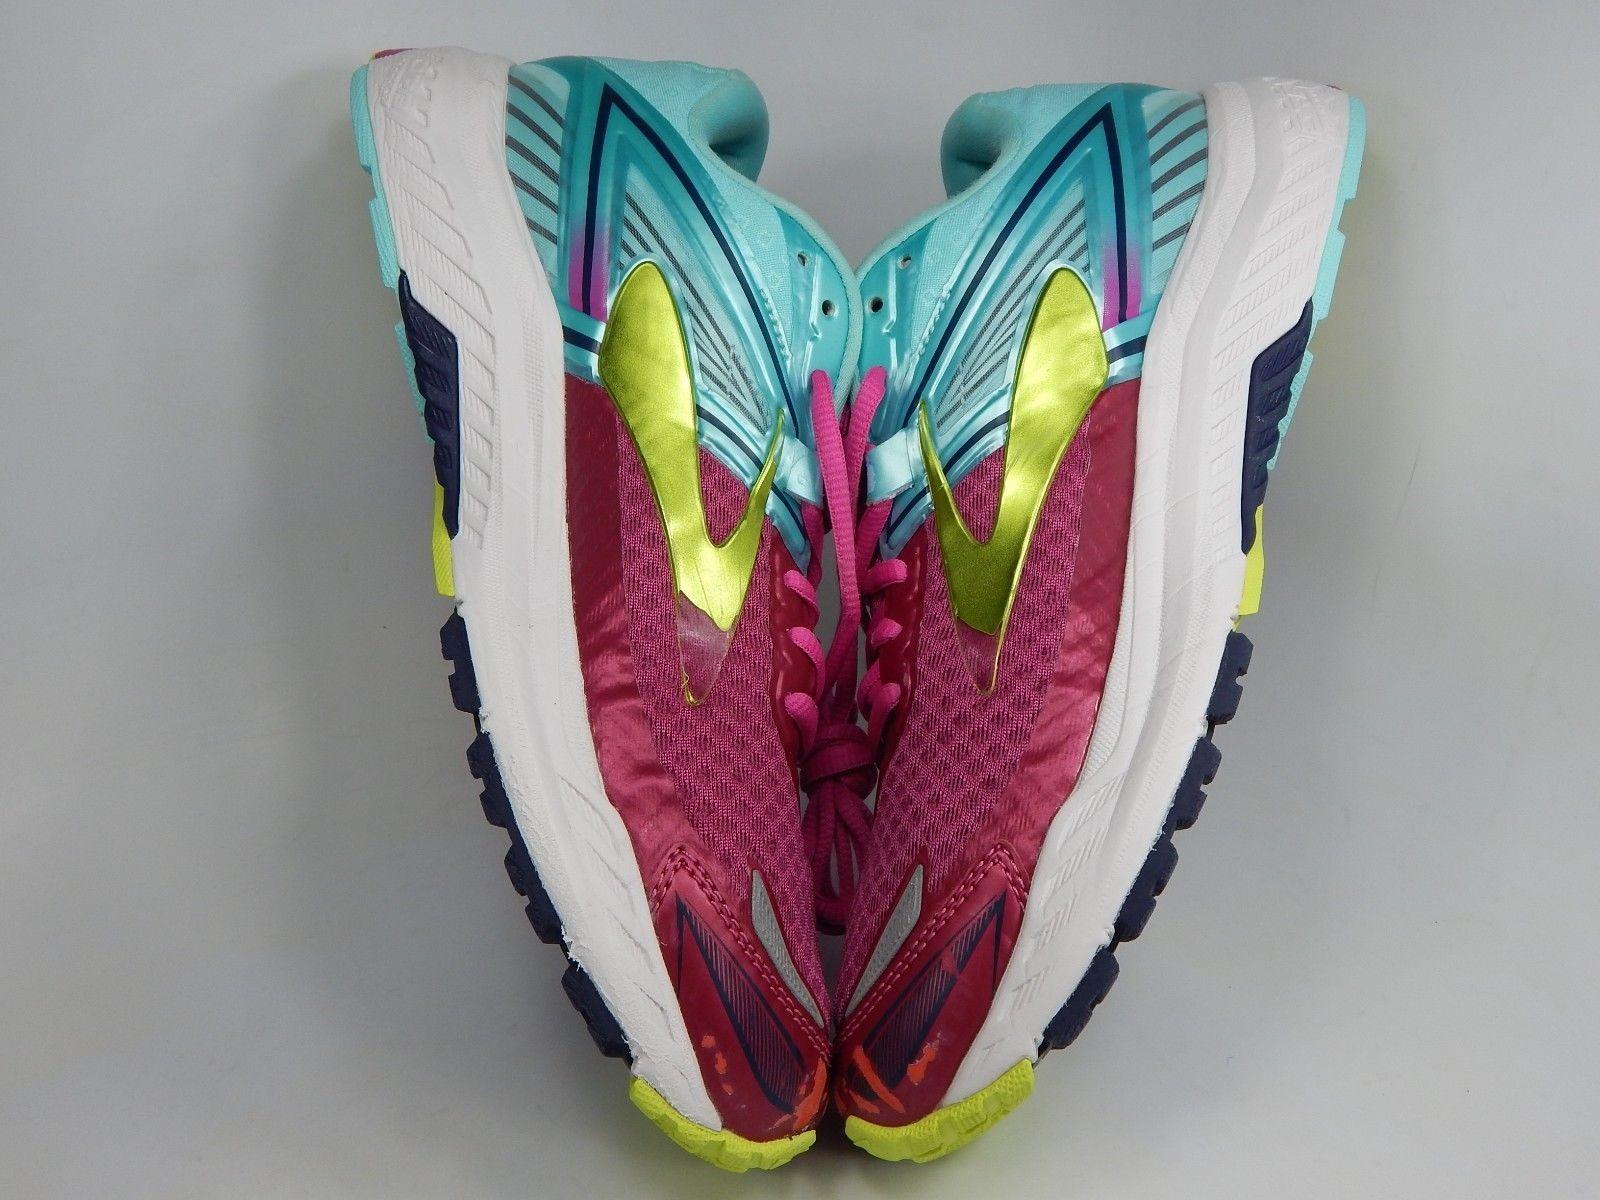 Brooks Ravenna 8 Running Shoes Women's Size US 10 M (B) EU 42 Berry 1202381B622